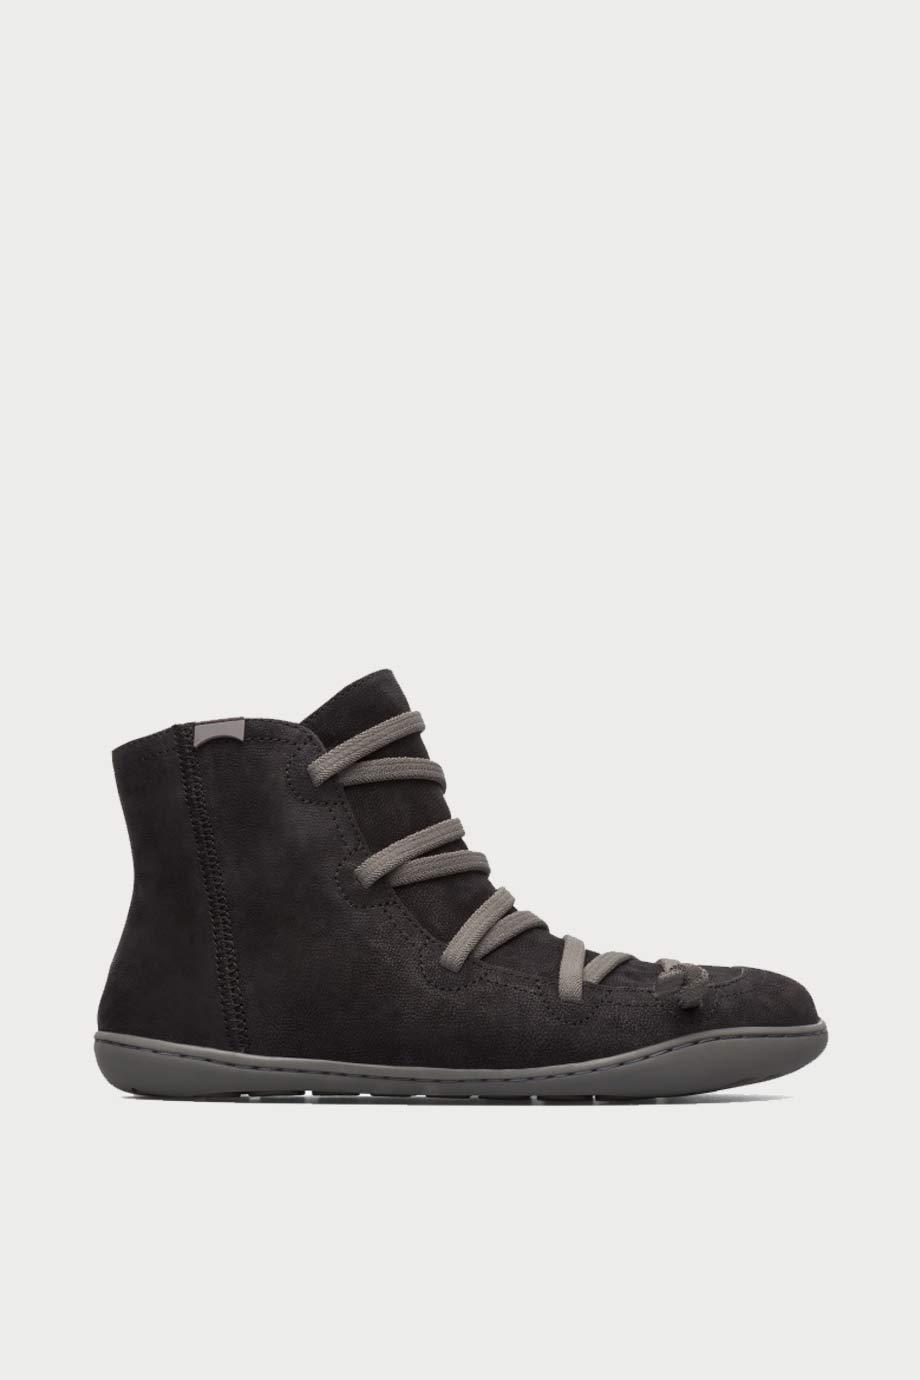 spiridoula metheniti shoes xalkida p Camper 46104 098 Peu Cami2